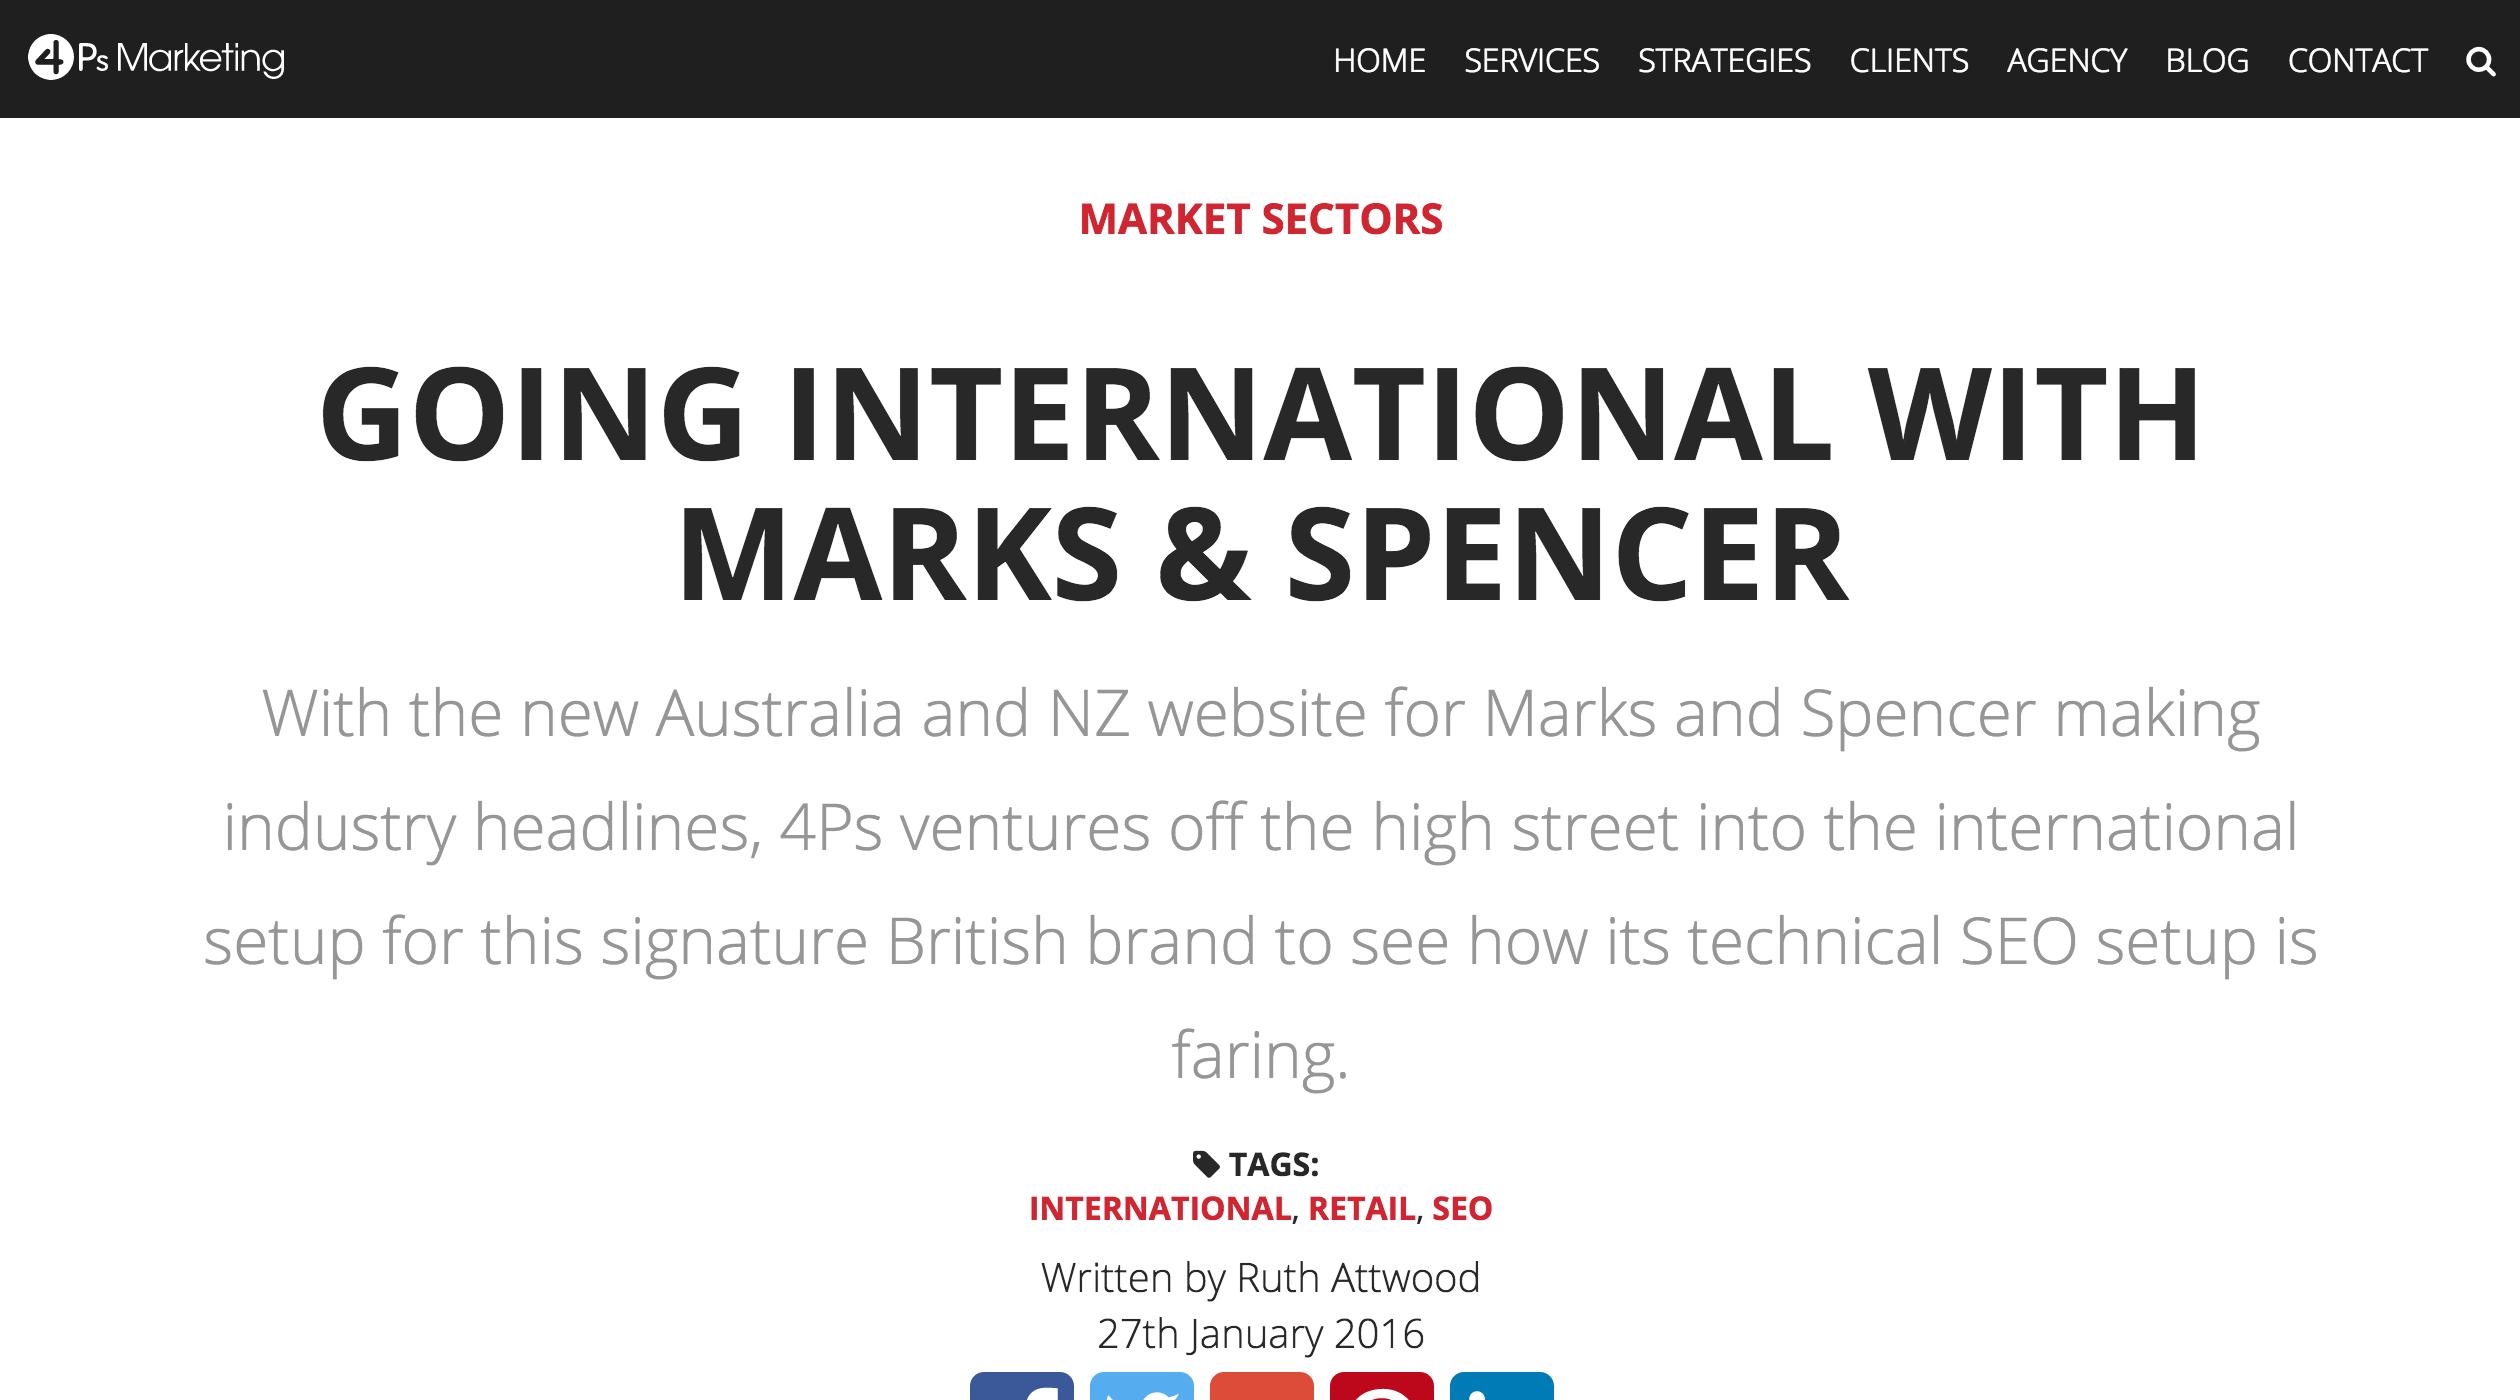 4ps marketing blog